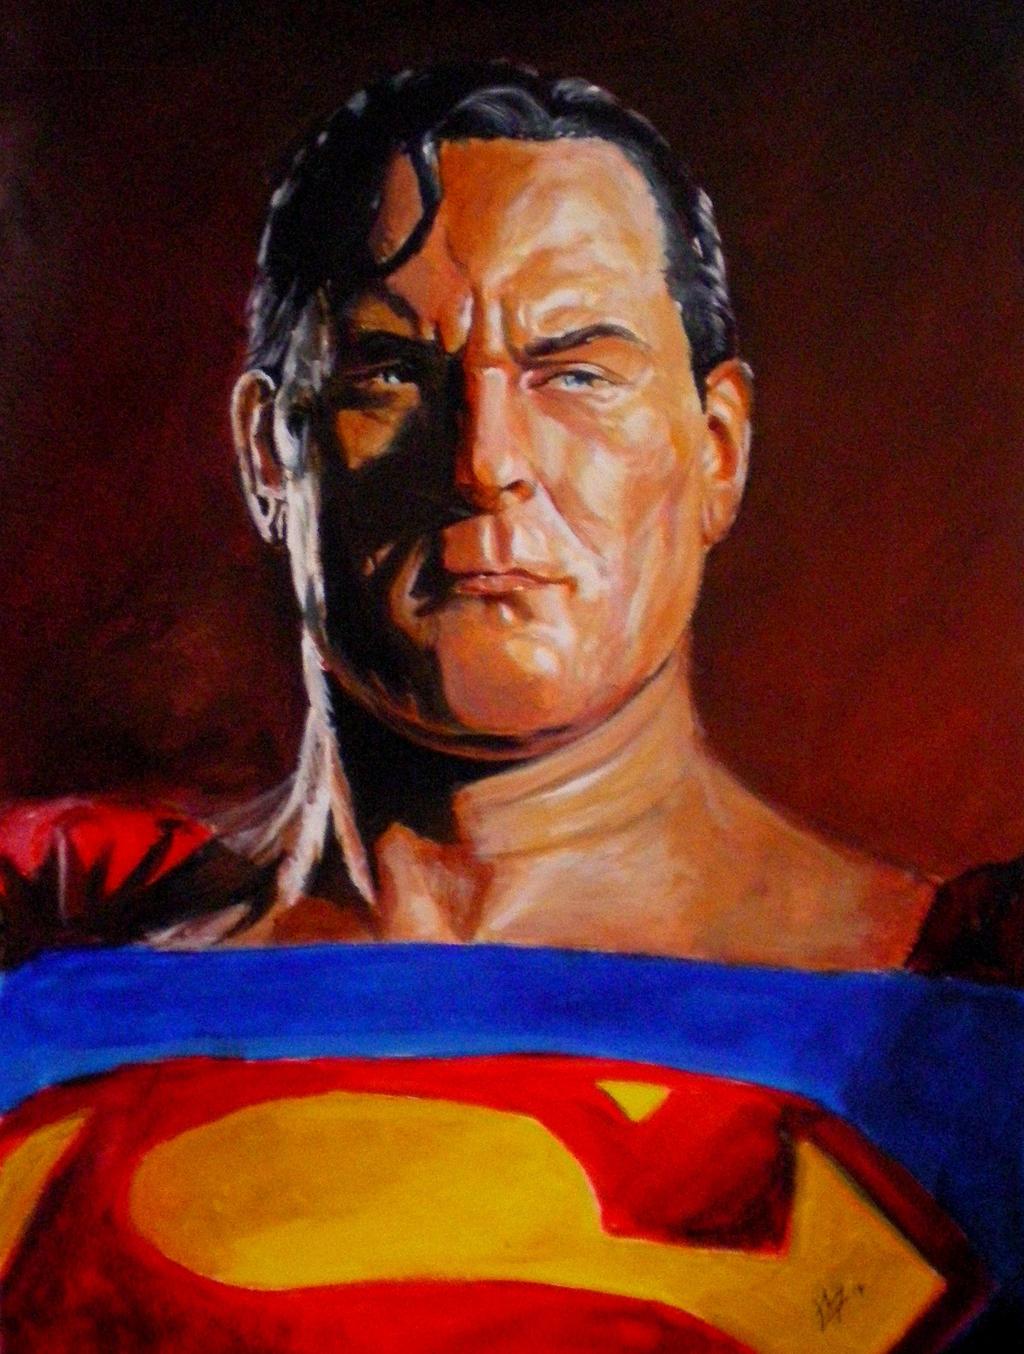 alex ross superman by gossamer1970 on deviantart